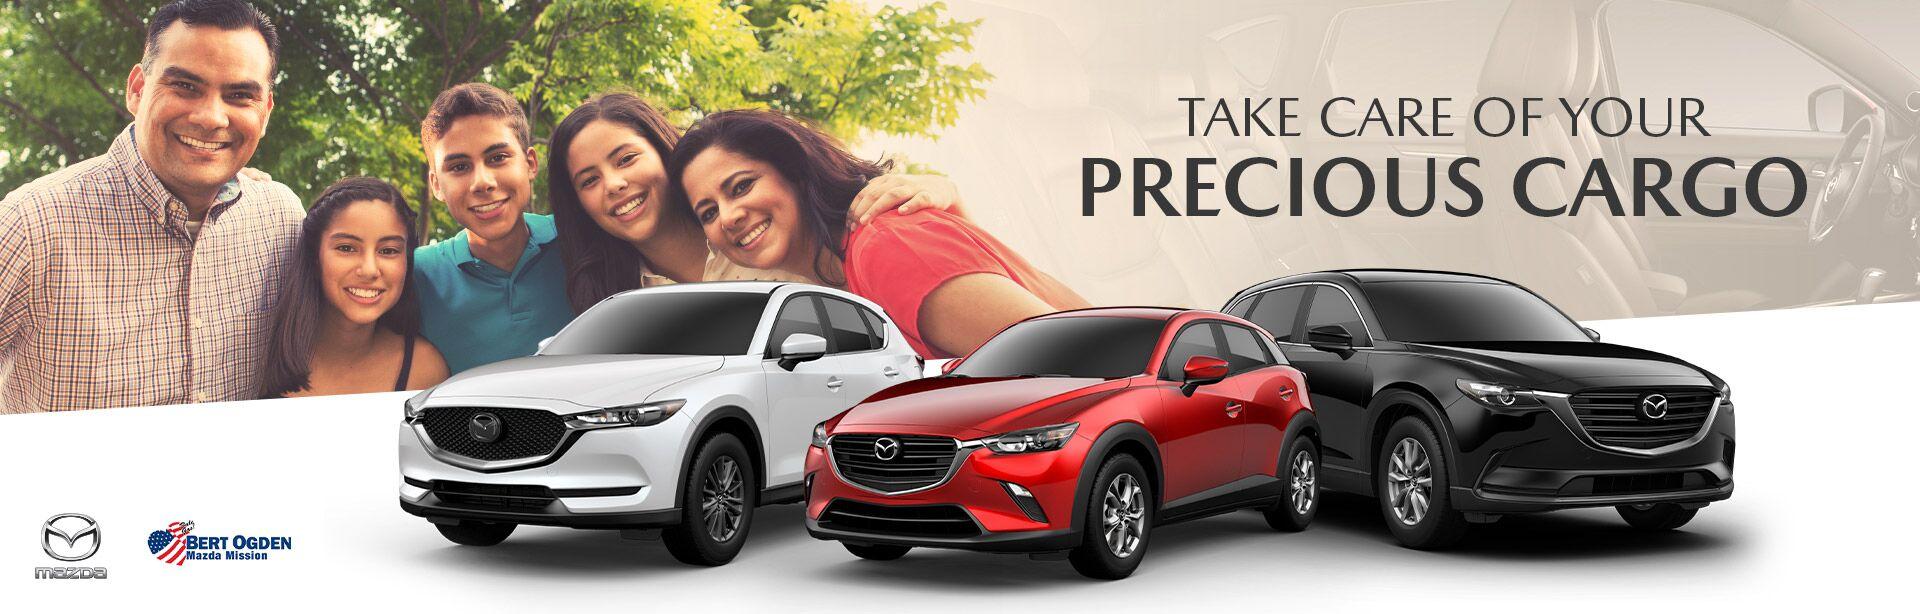 Mazda Vehicles For Large Families - Bert Ogden Mission Mazda - Mission, TX